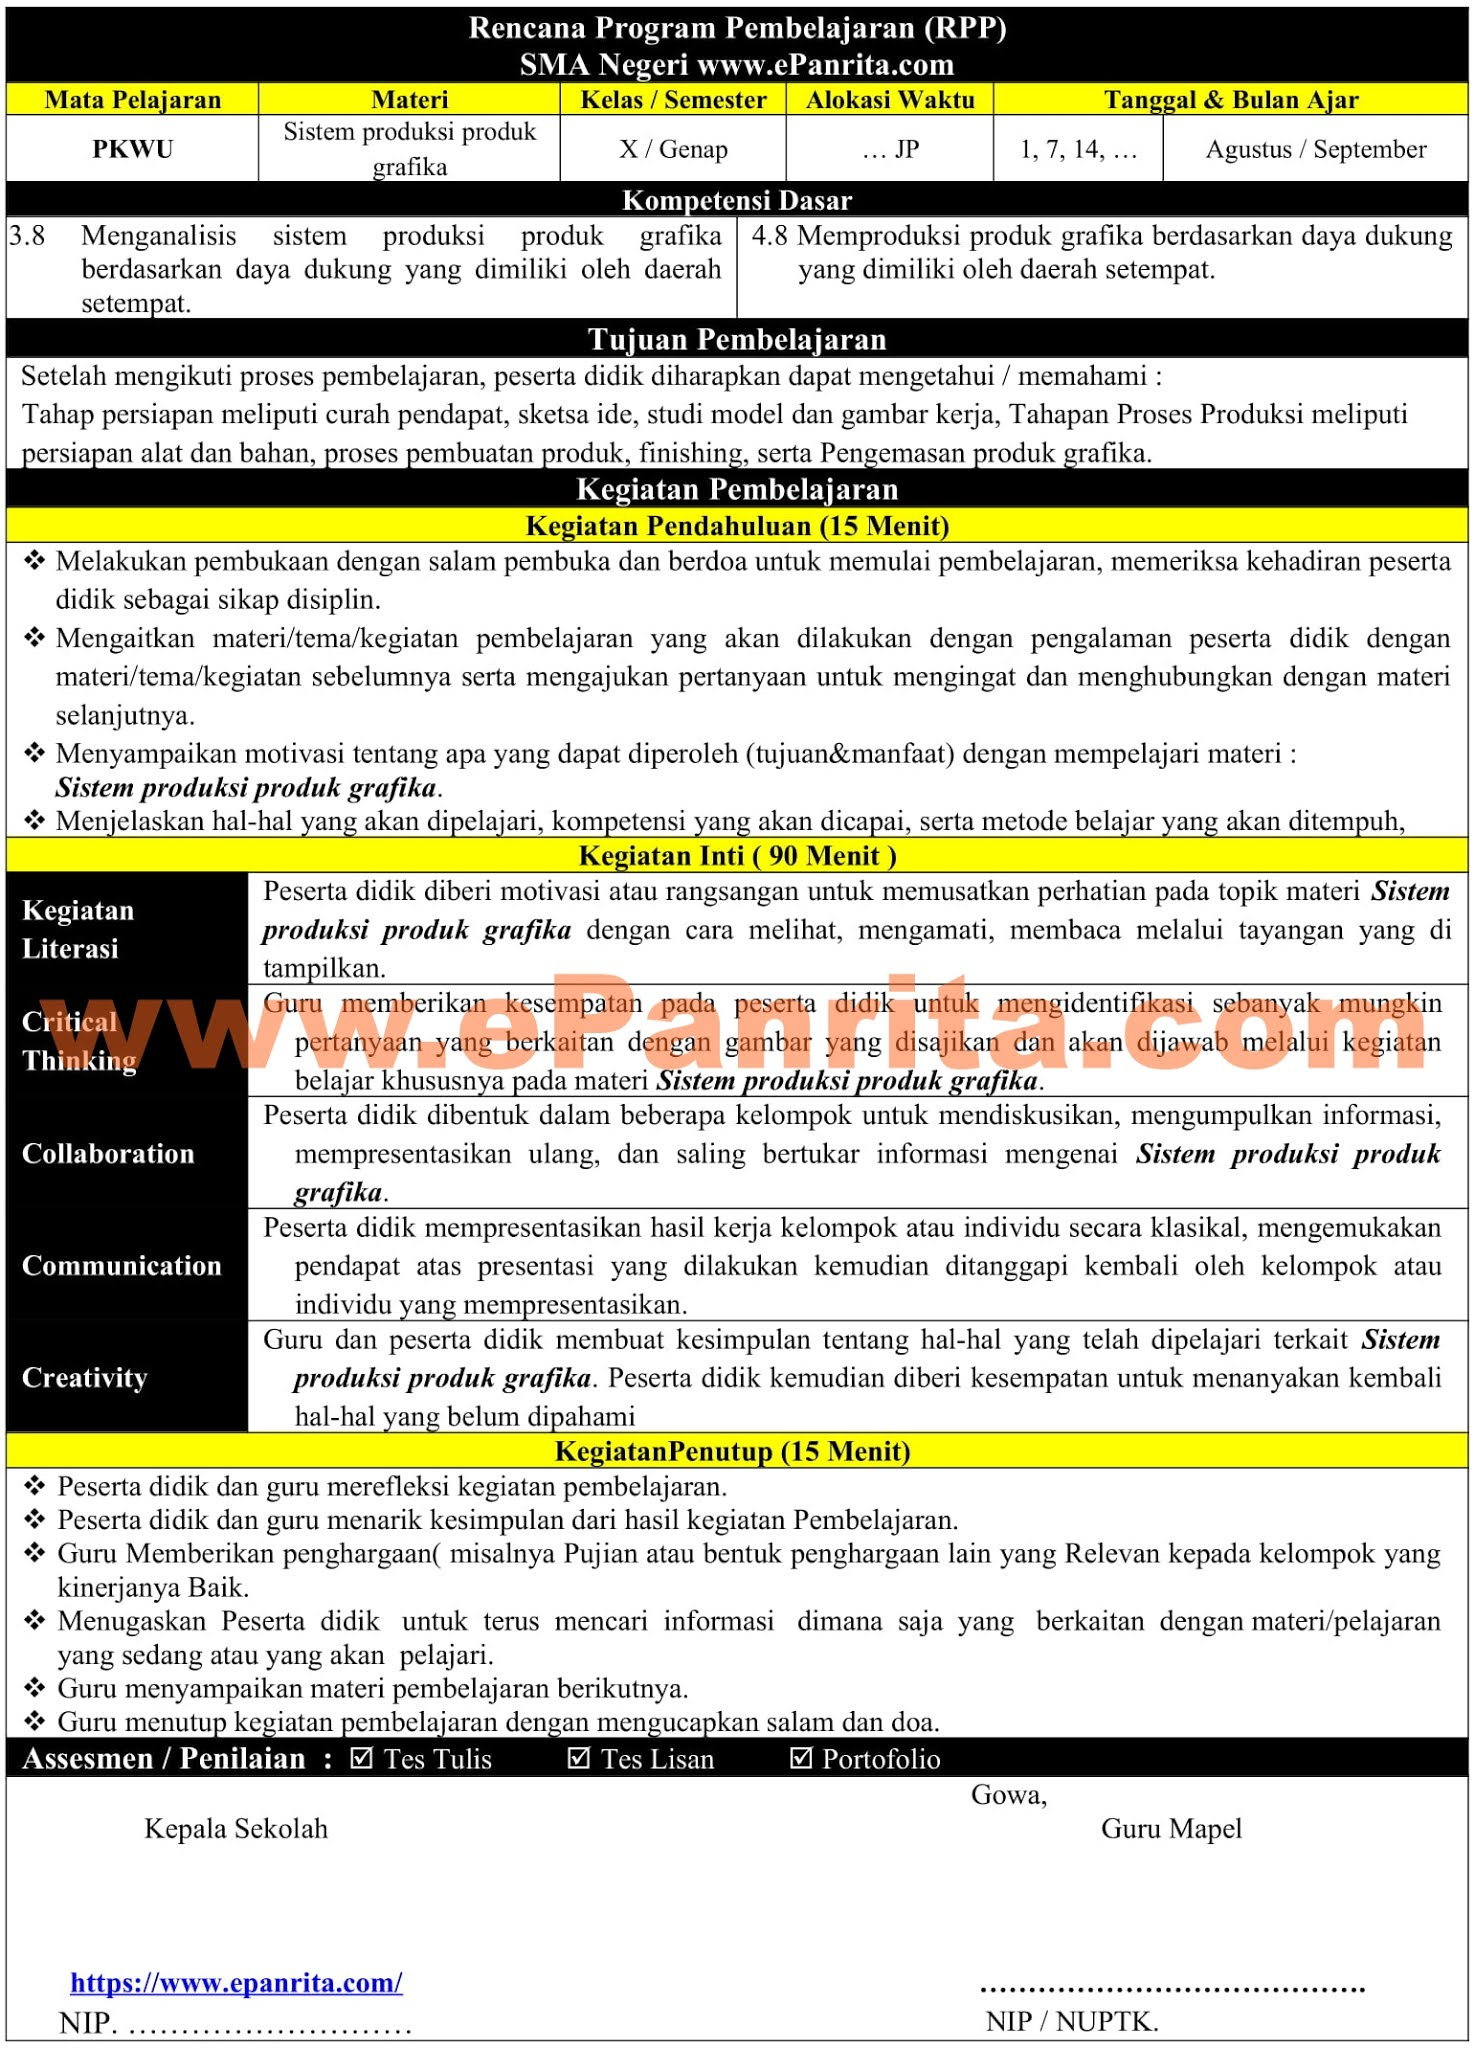 RPP 1 Halaman Prakarya Aspek Rekayasa (Sistem produksi produk grafika)